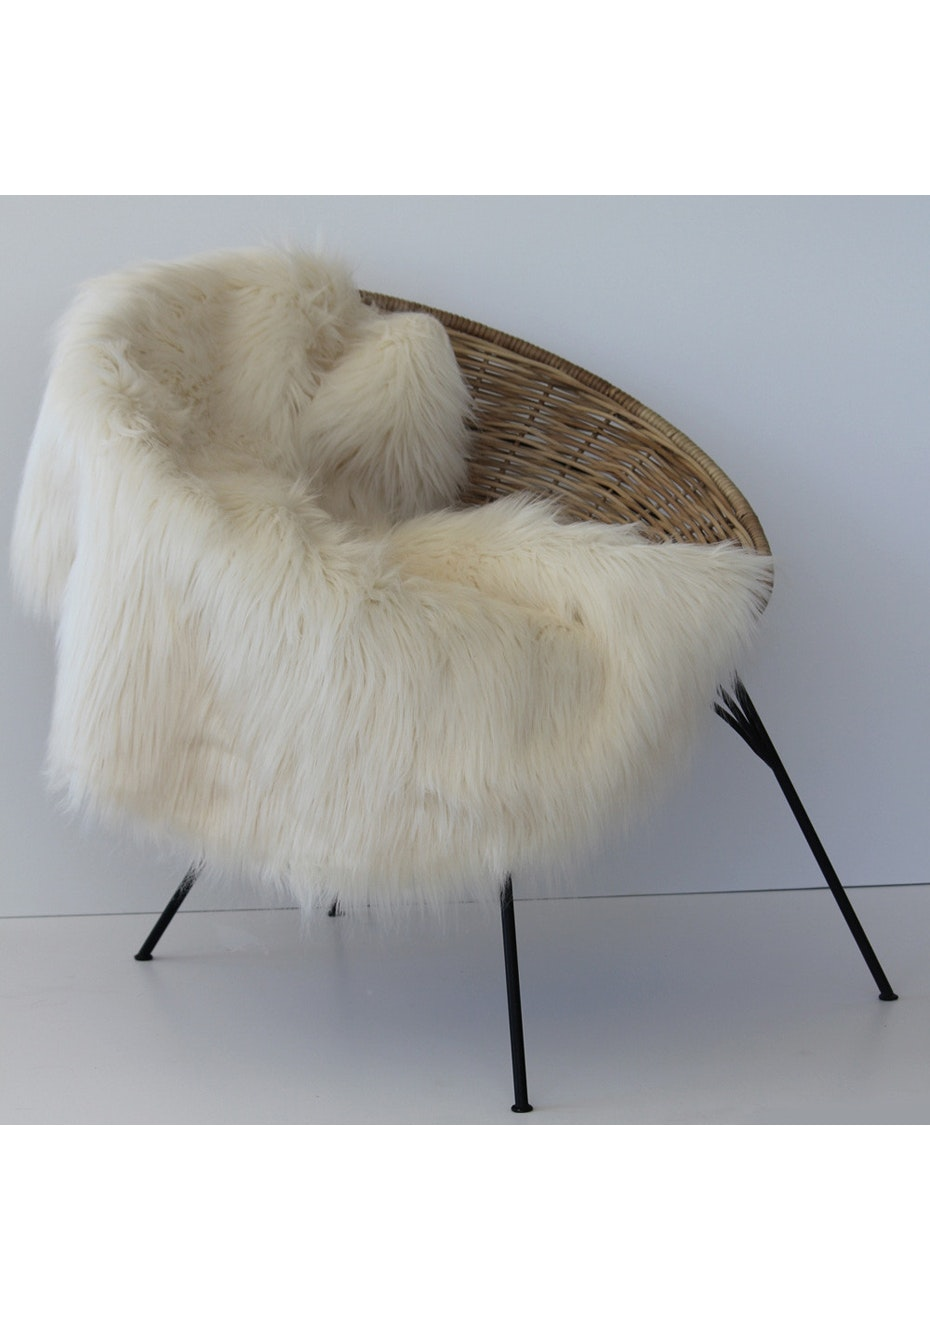 Me & My Trend - Ivory Sheep Rug/Throw